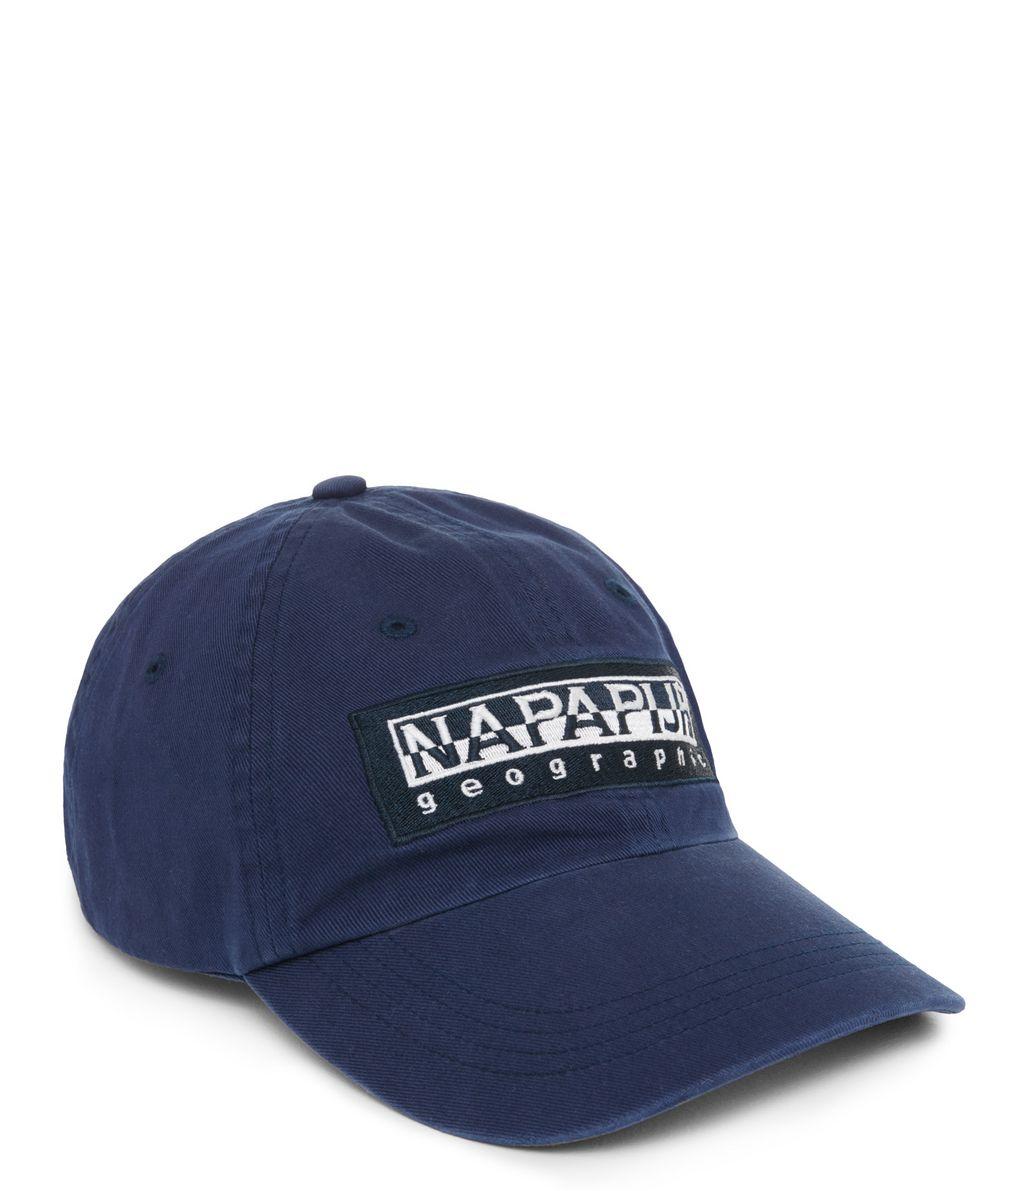 NAPAPIJRI FLON  HAT,DARK BLUE